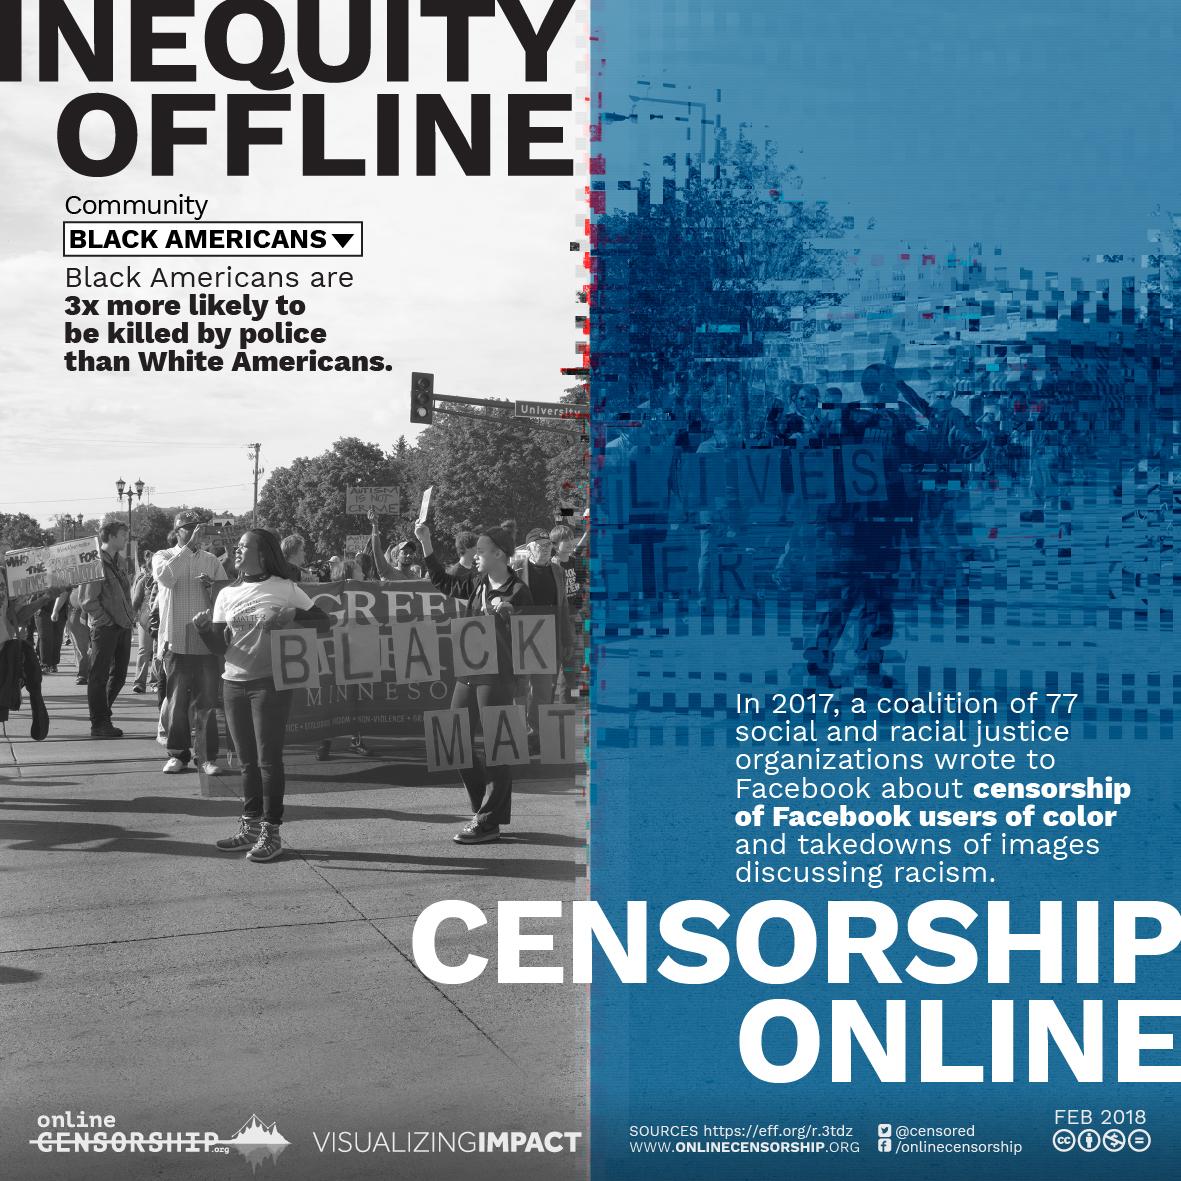 Offline/Online: Black Americans